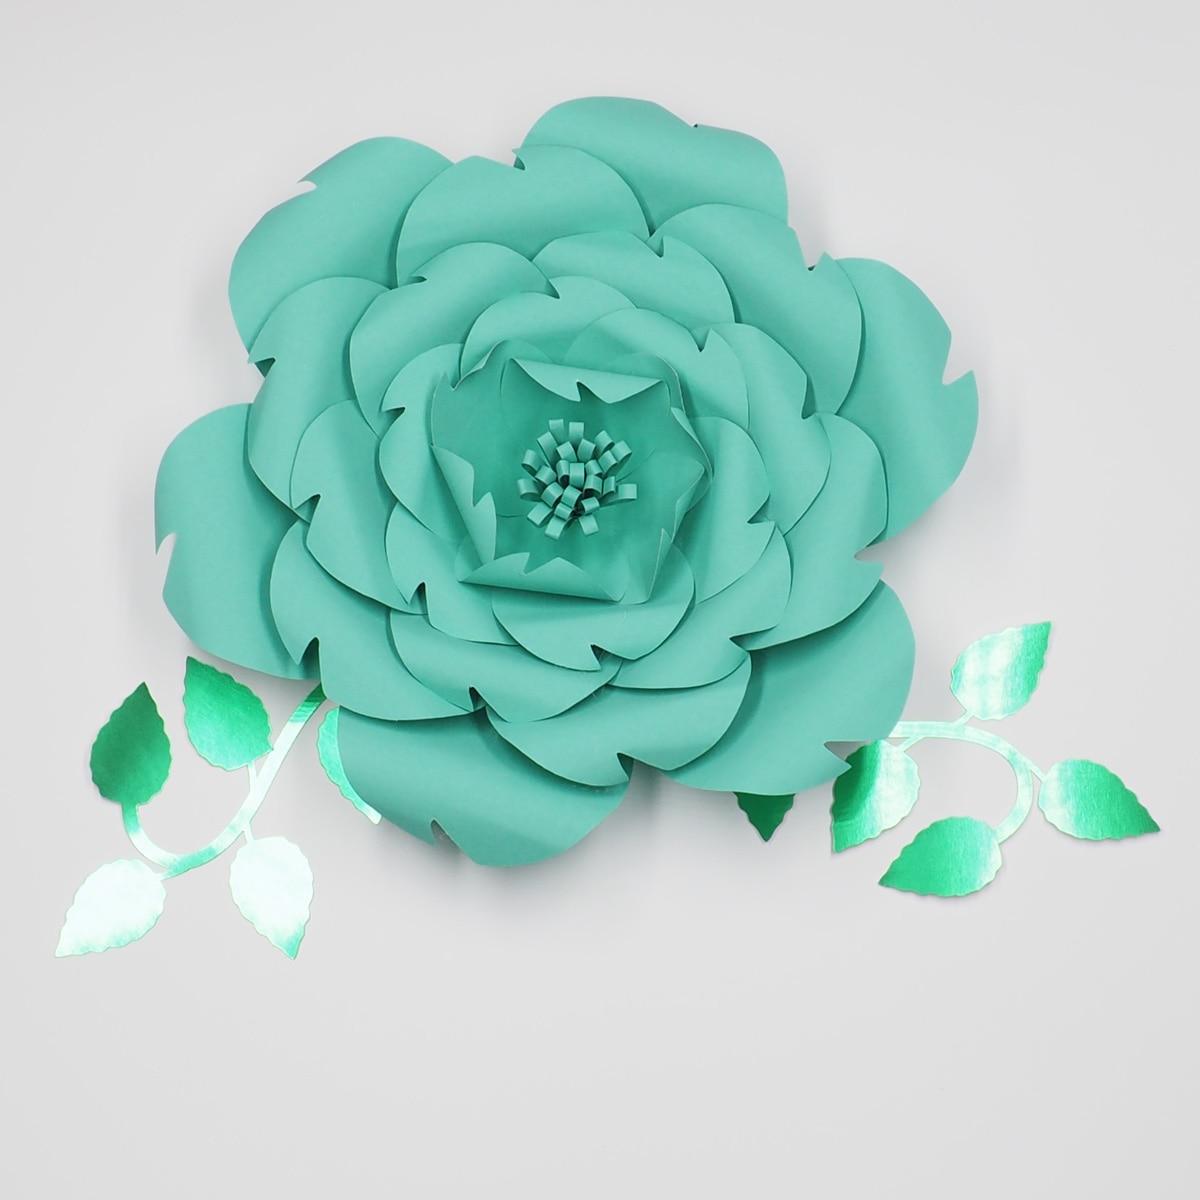 1Piece Flower+2pcs Leaves Giant Paper Flowers Wedding